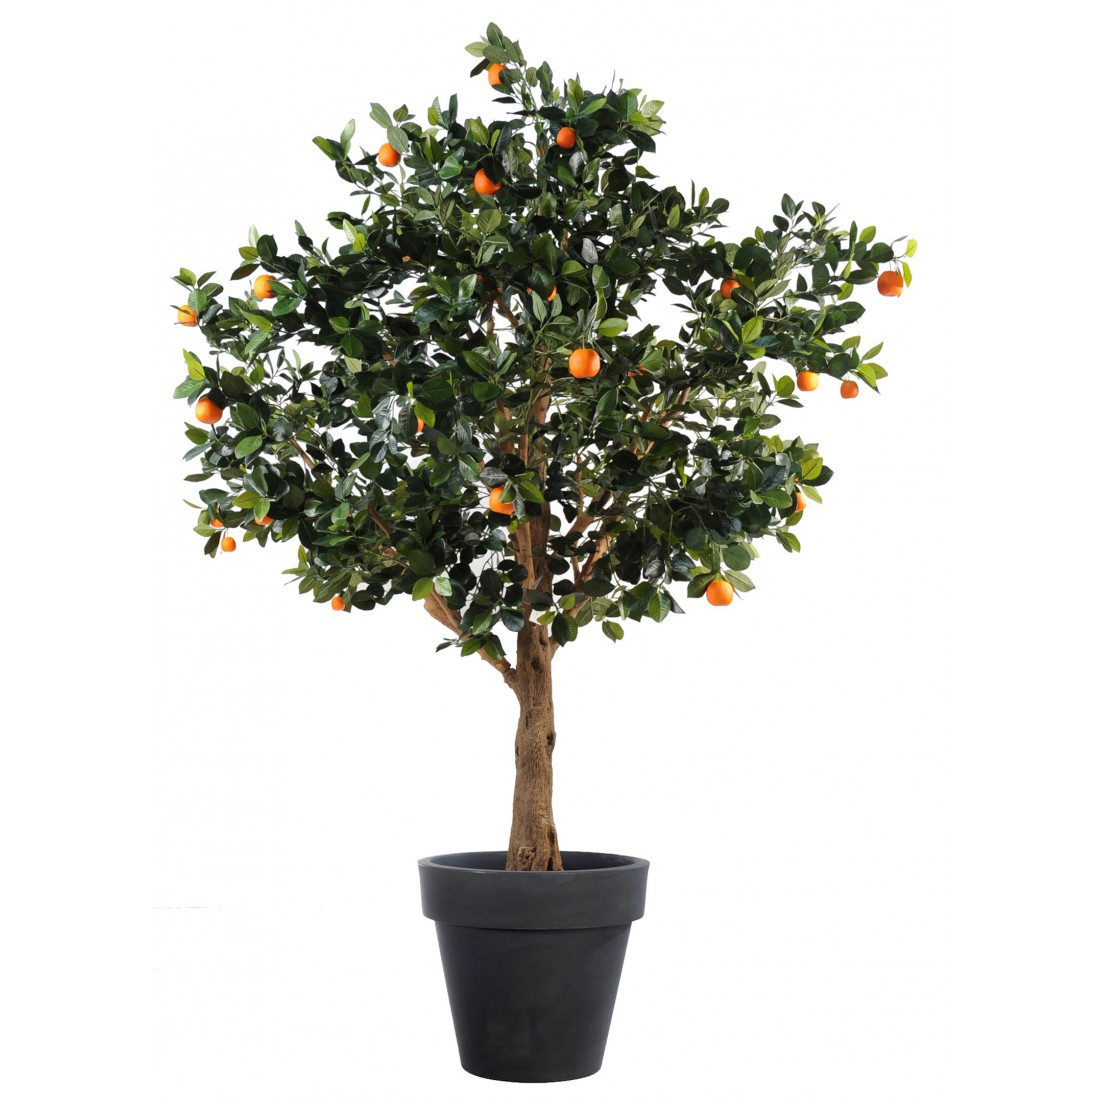 oranger artificiel arbre 210 cm arbres mediterraneens reflets nature lyon. Black Bedroom Furniture Sets. Home Design Ideas